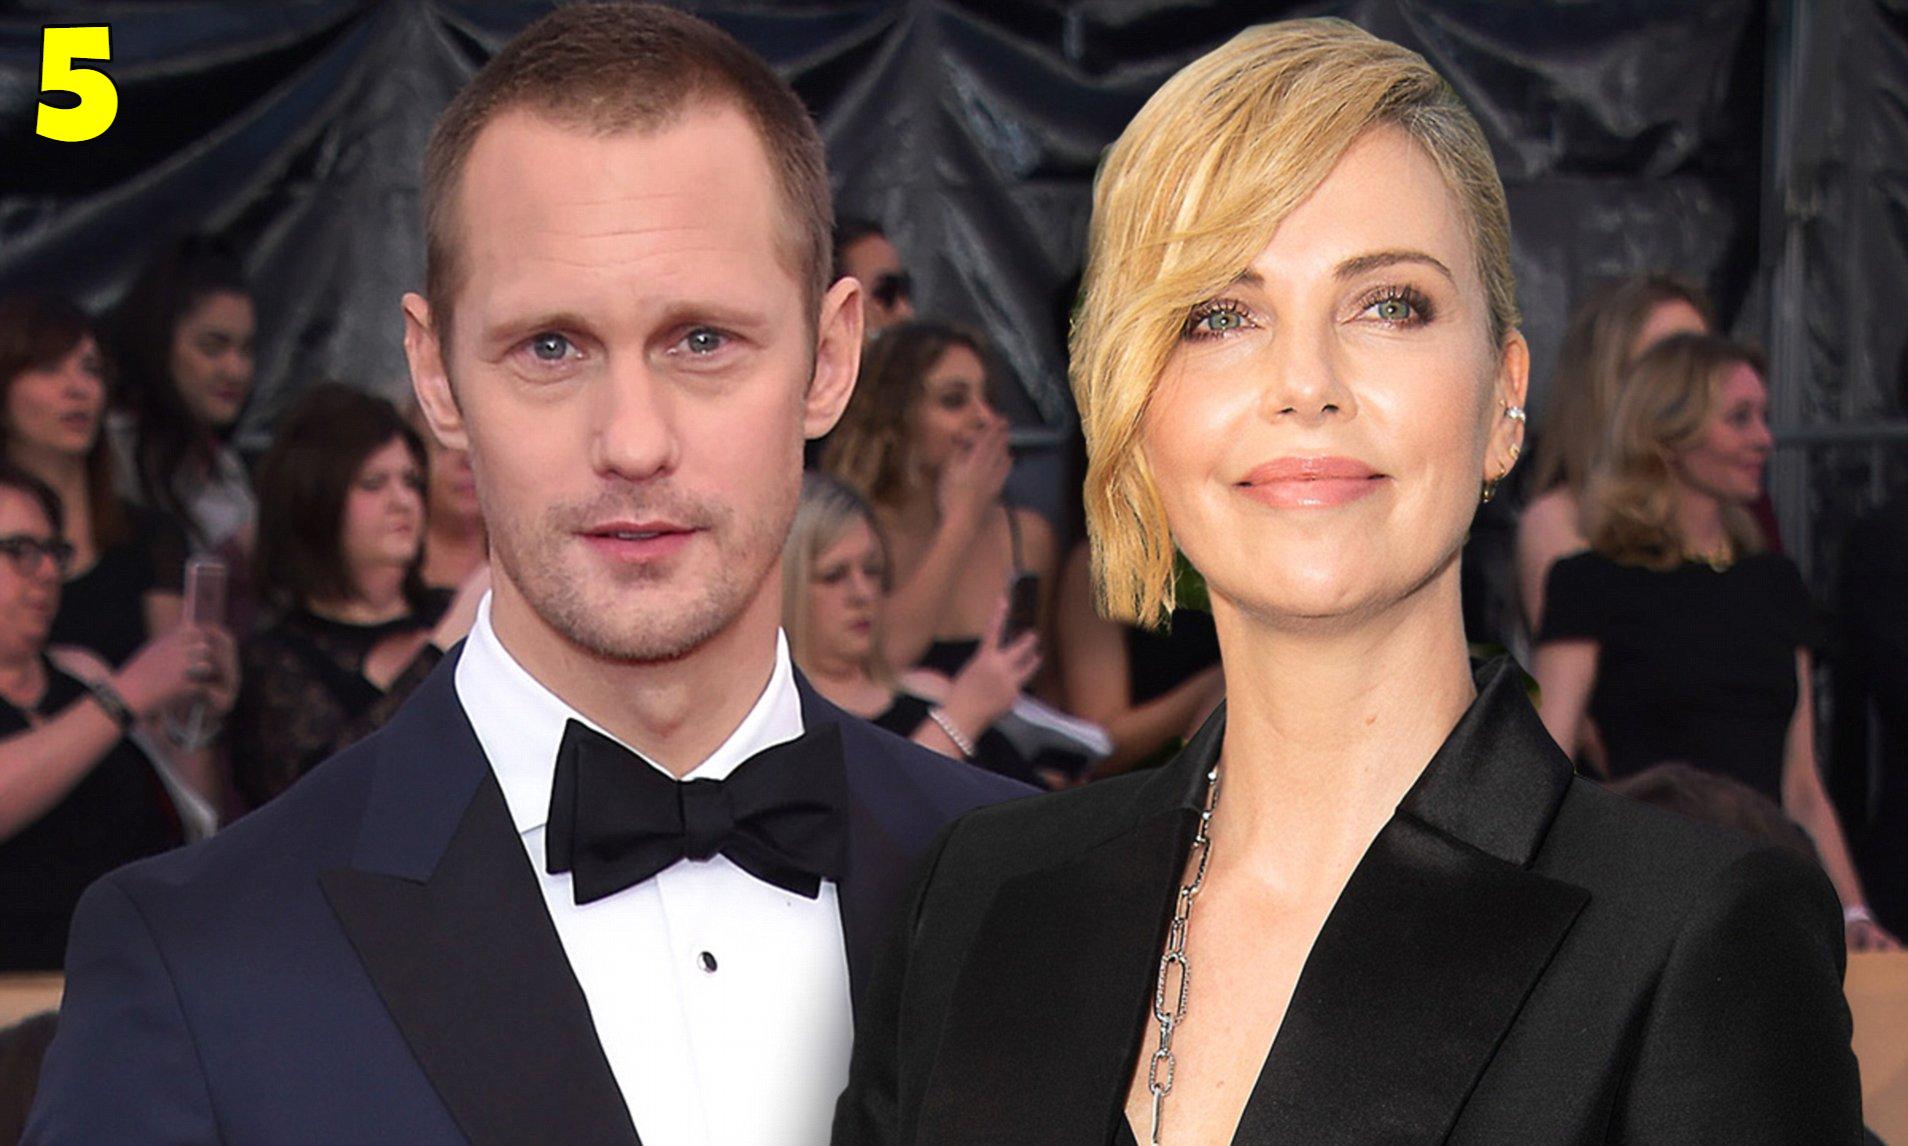 Alexander Skarsgård and Charlize Theron Dating